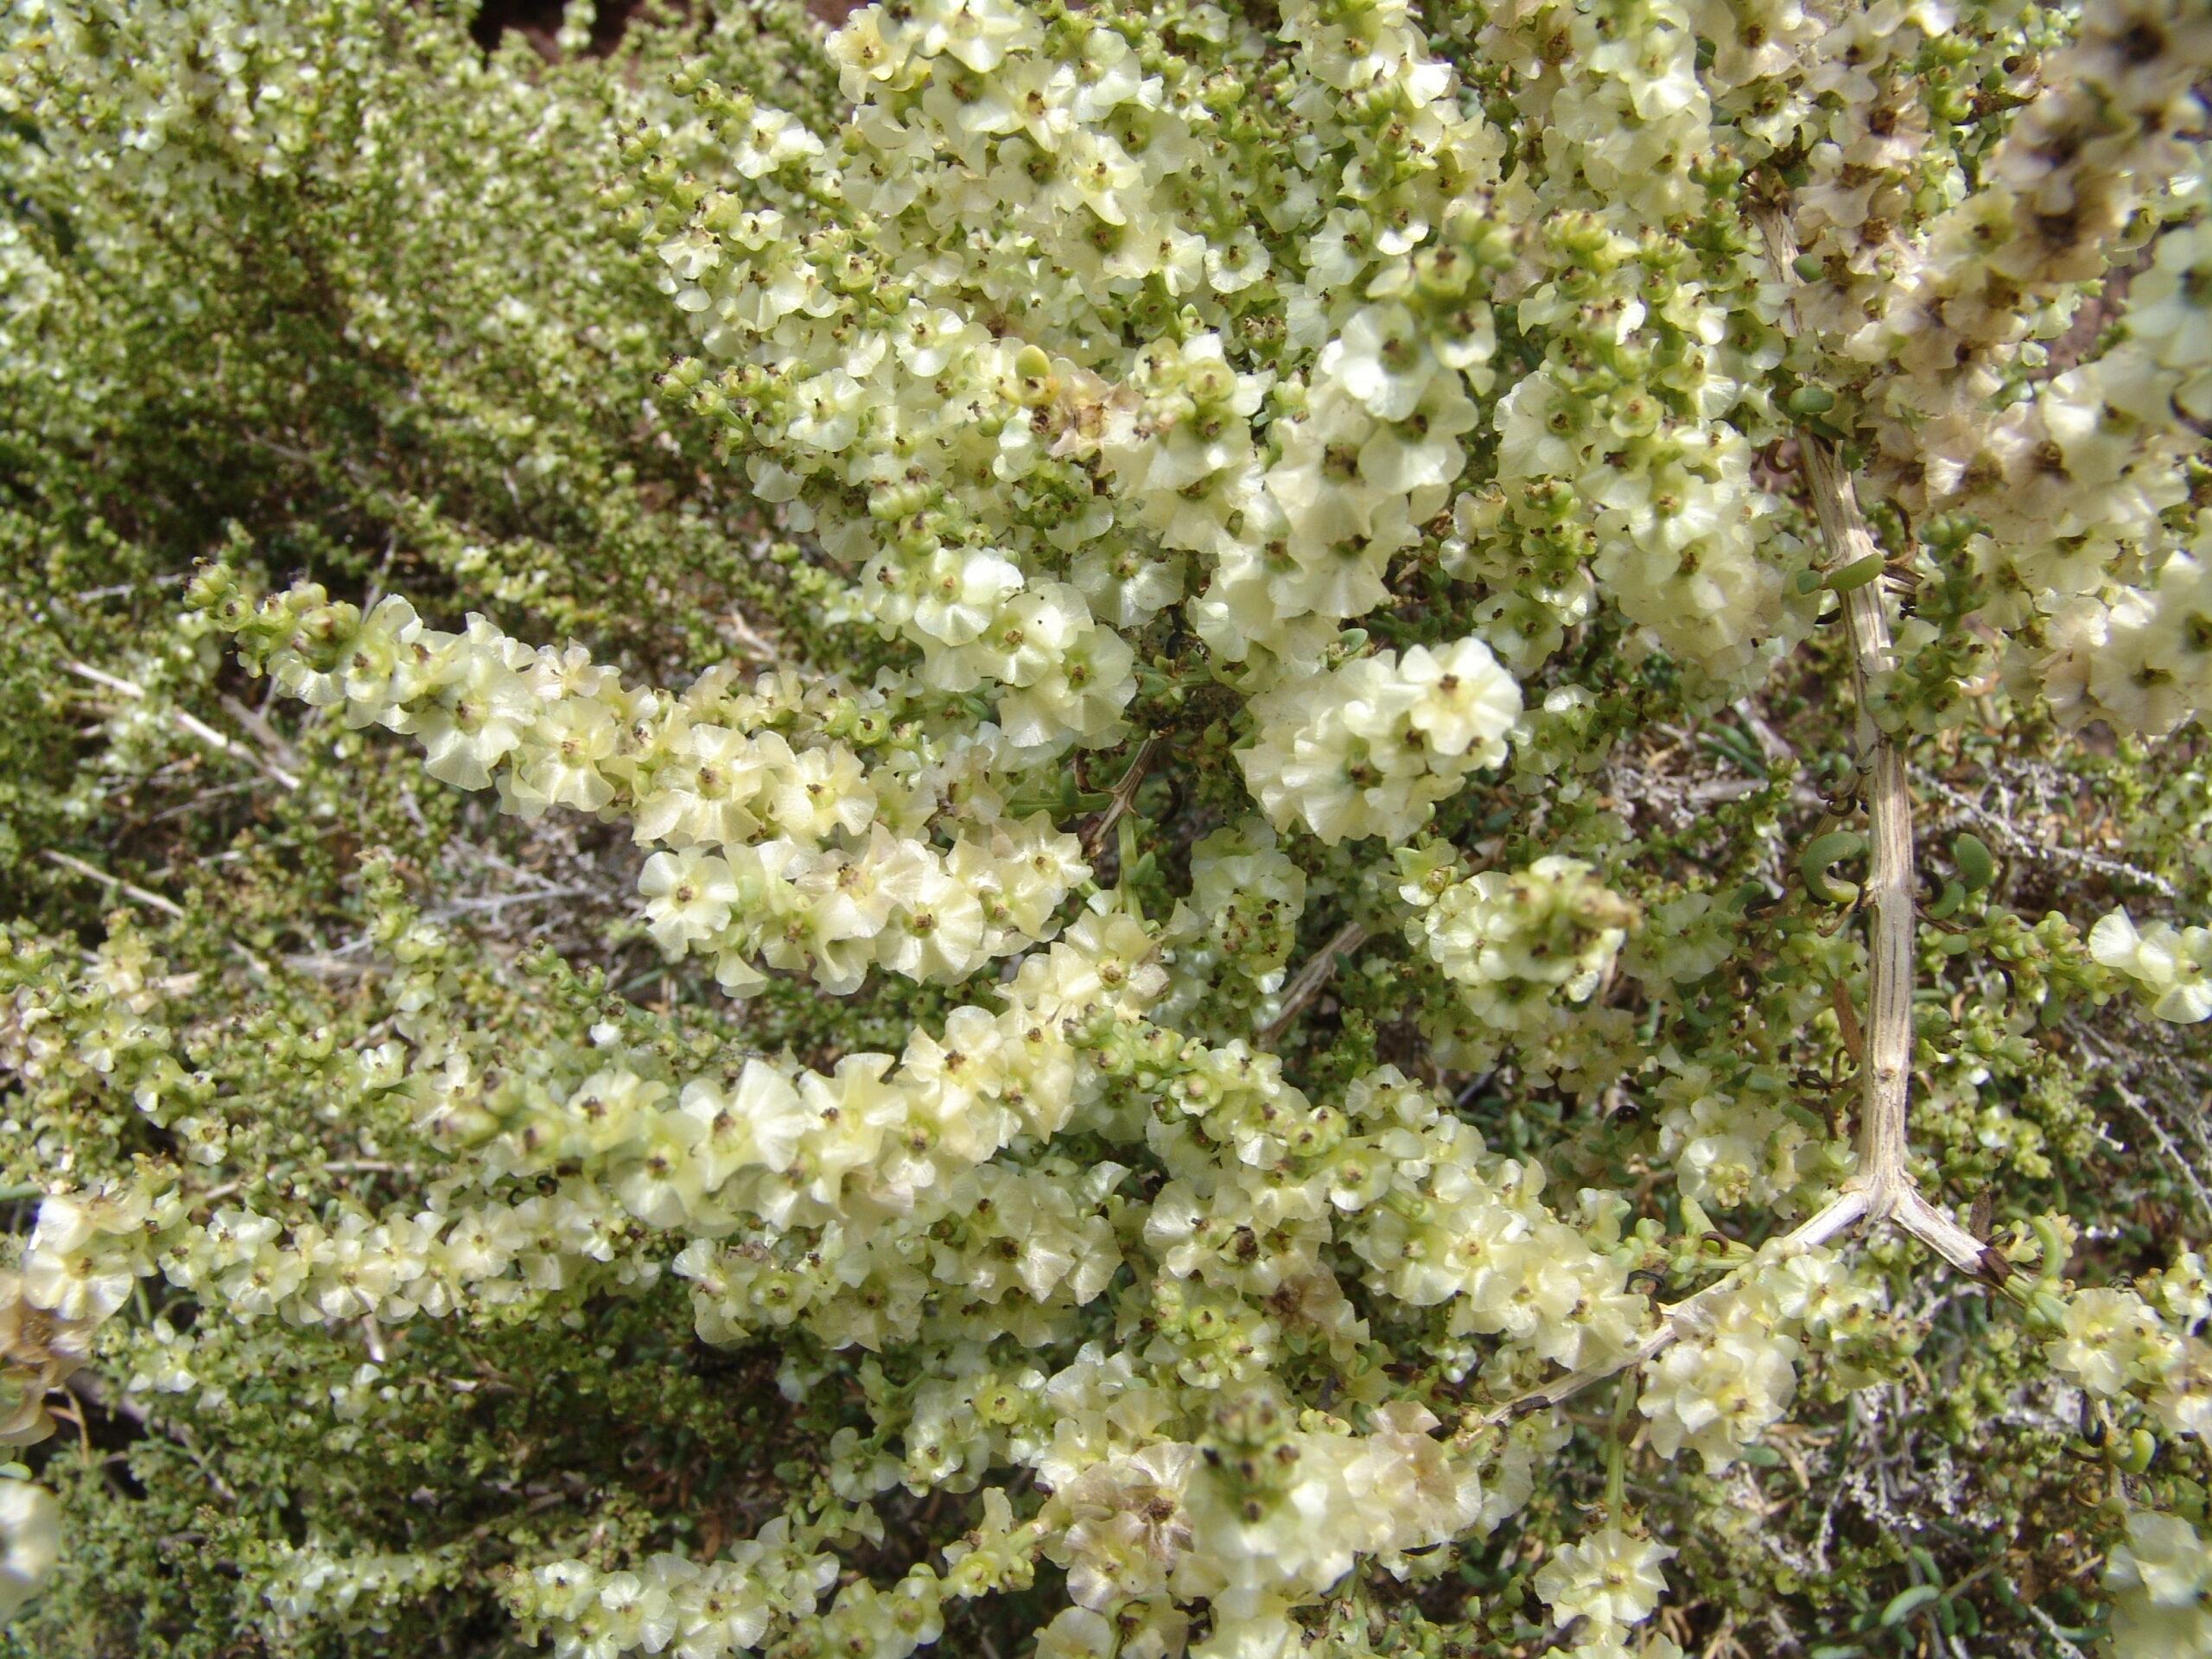 dsc09944-flores-salsola-bco-infierno-scaled.jpg